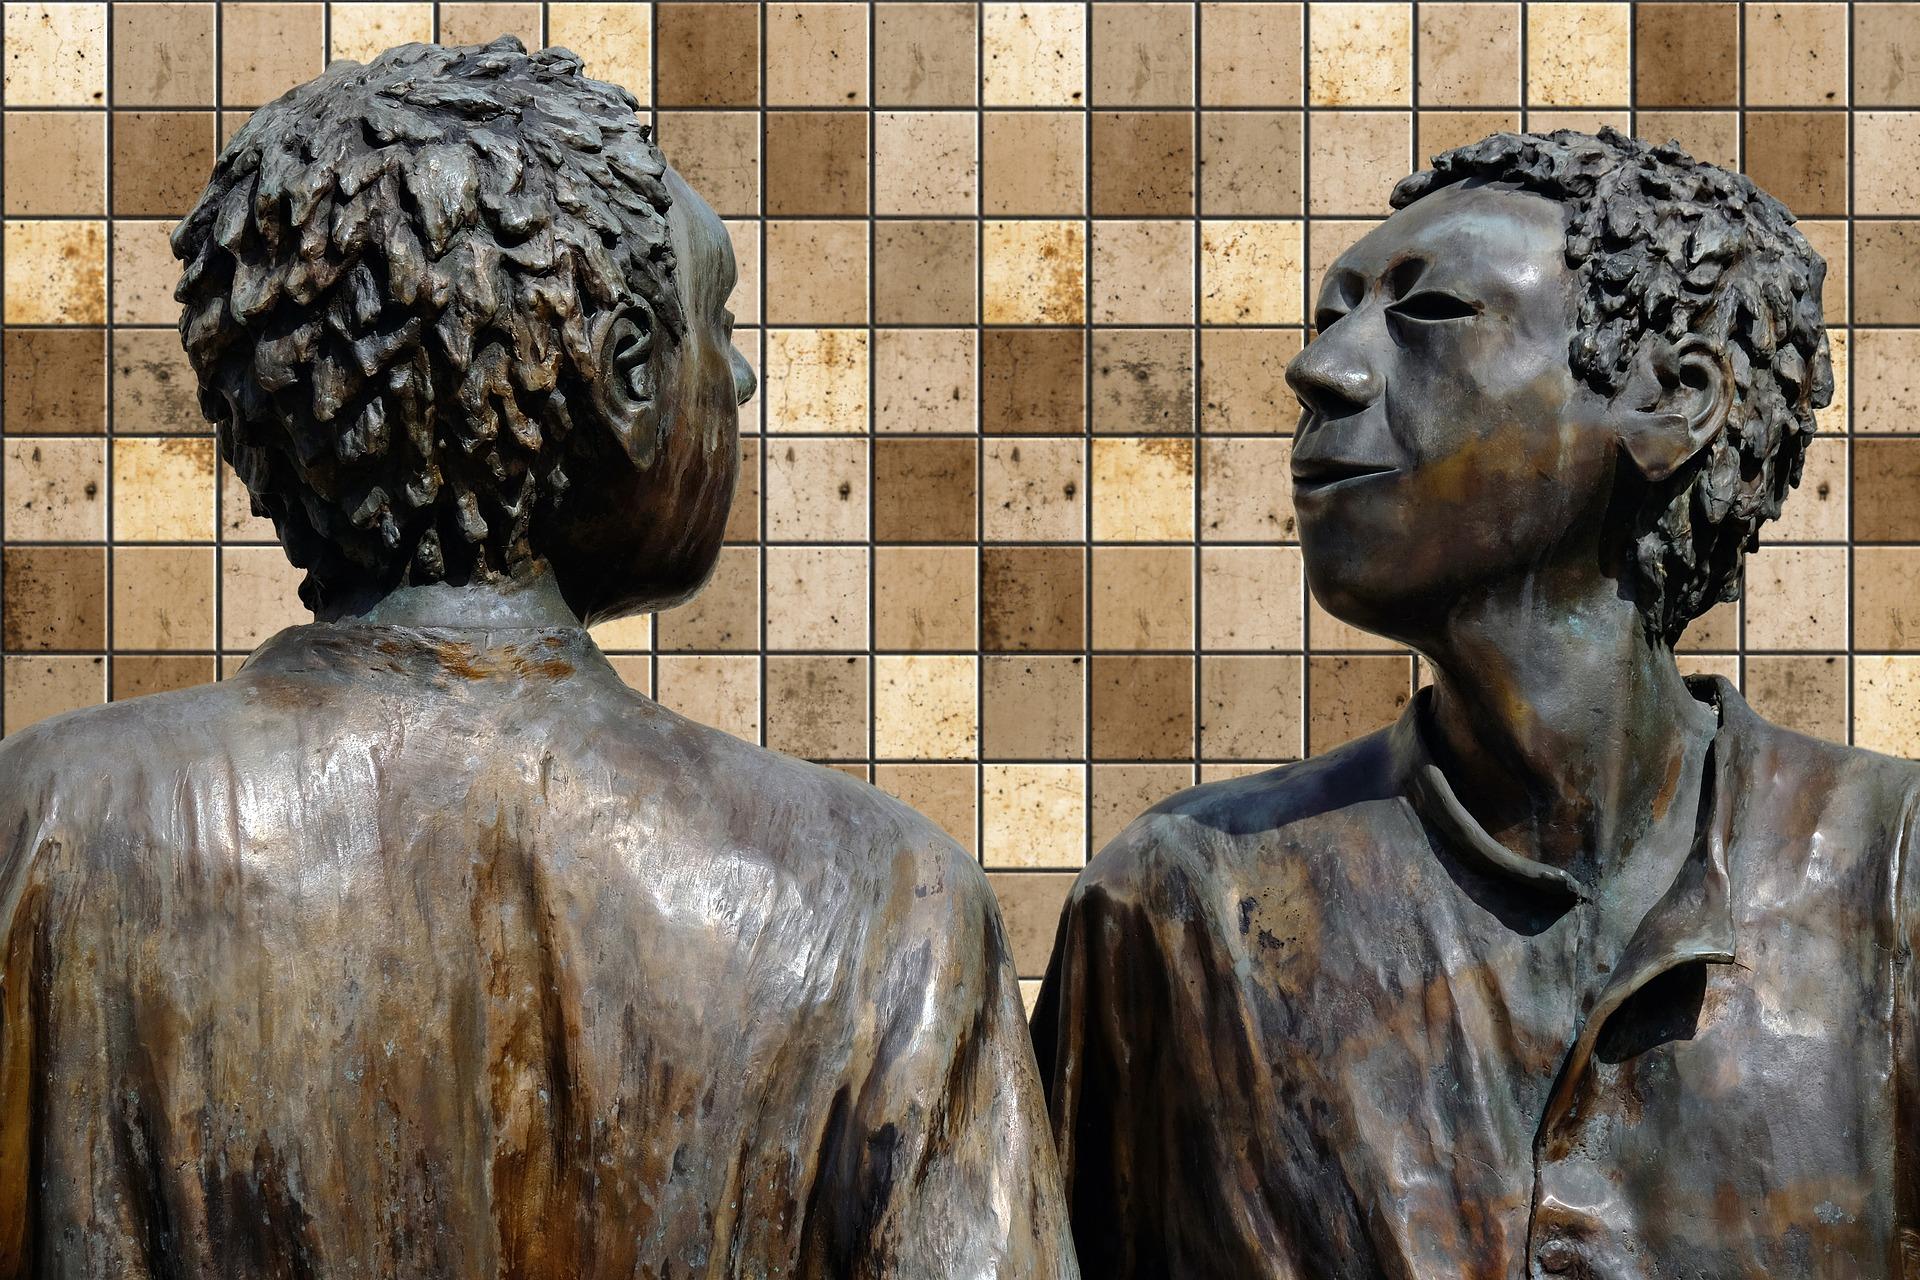 sculpture-2196139_1920